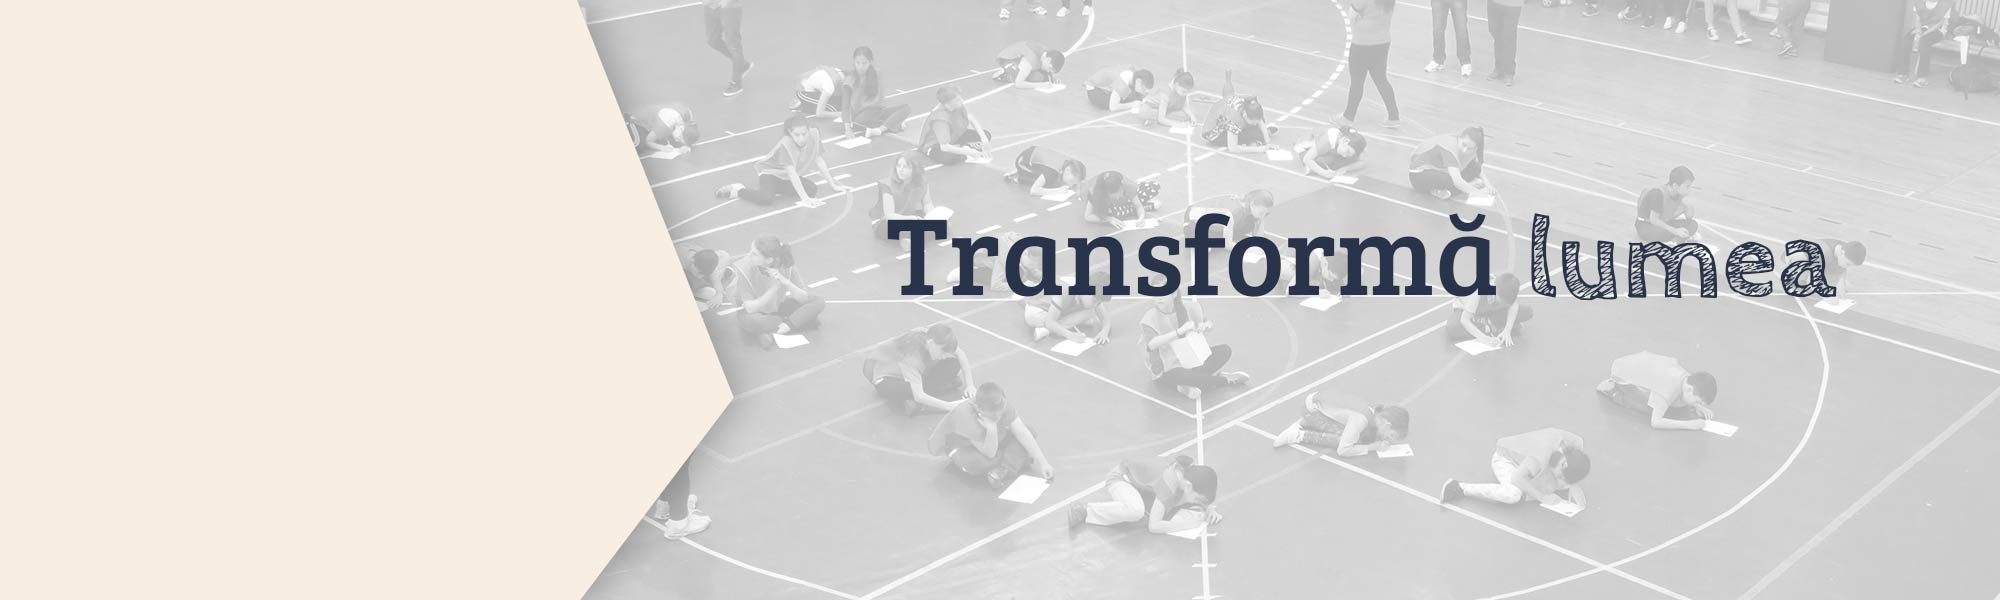 Awana-transforma-lumea